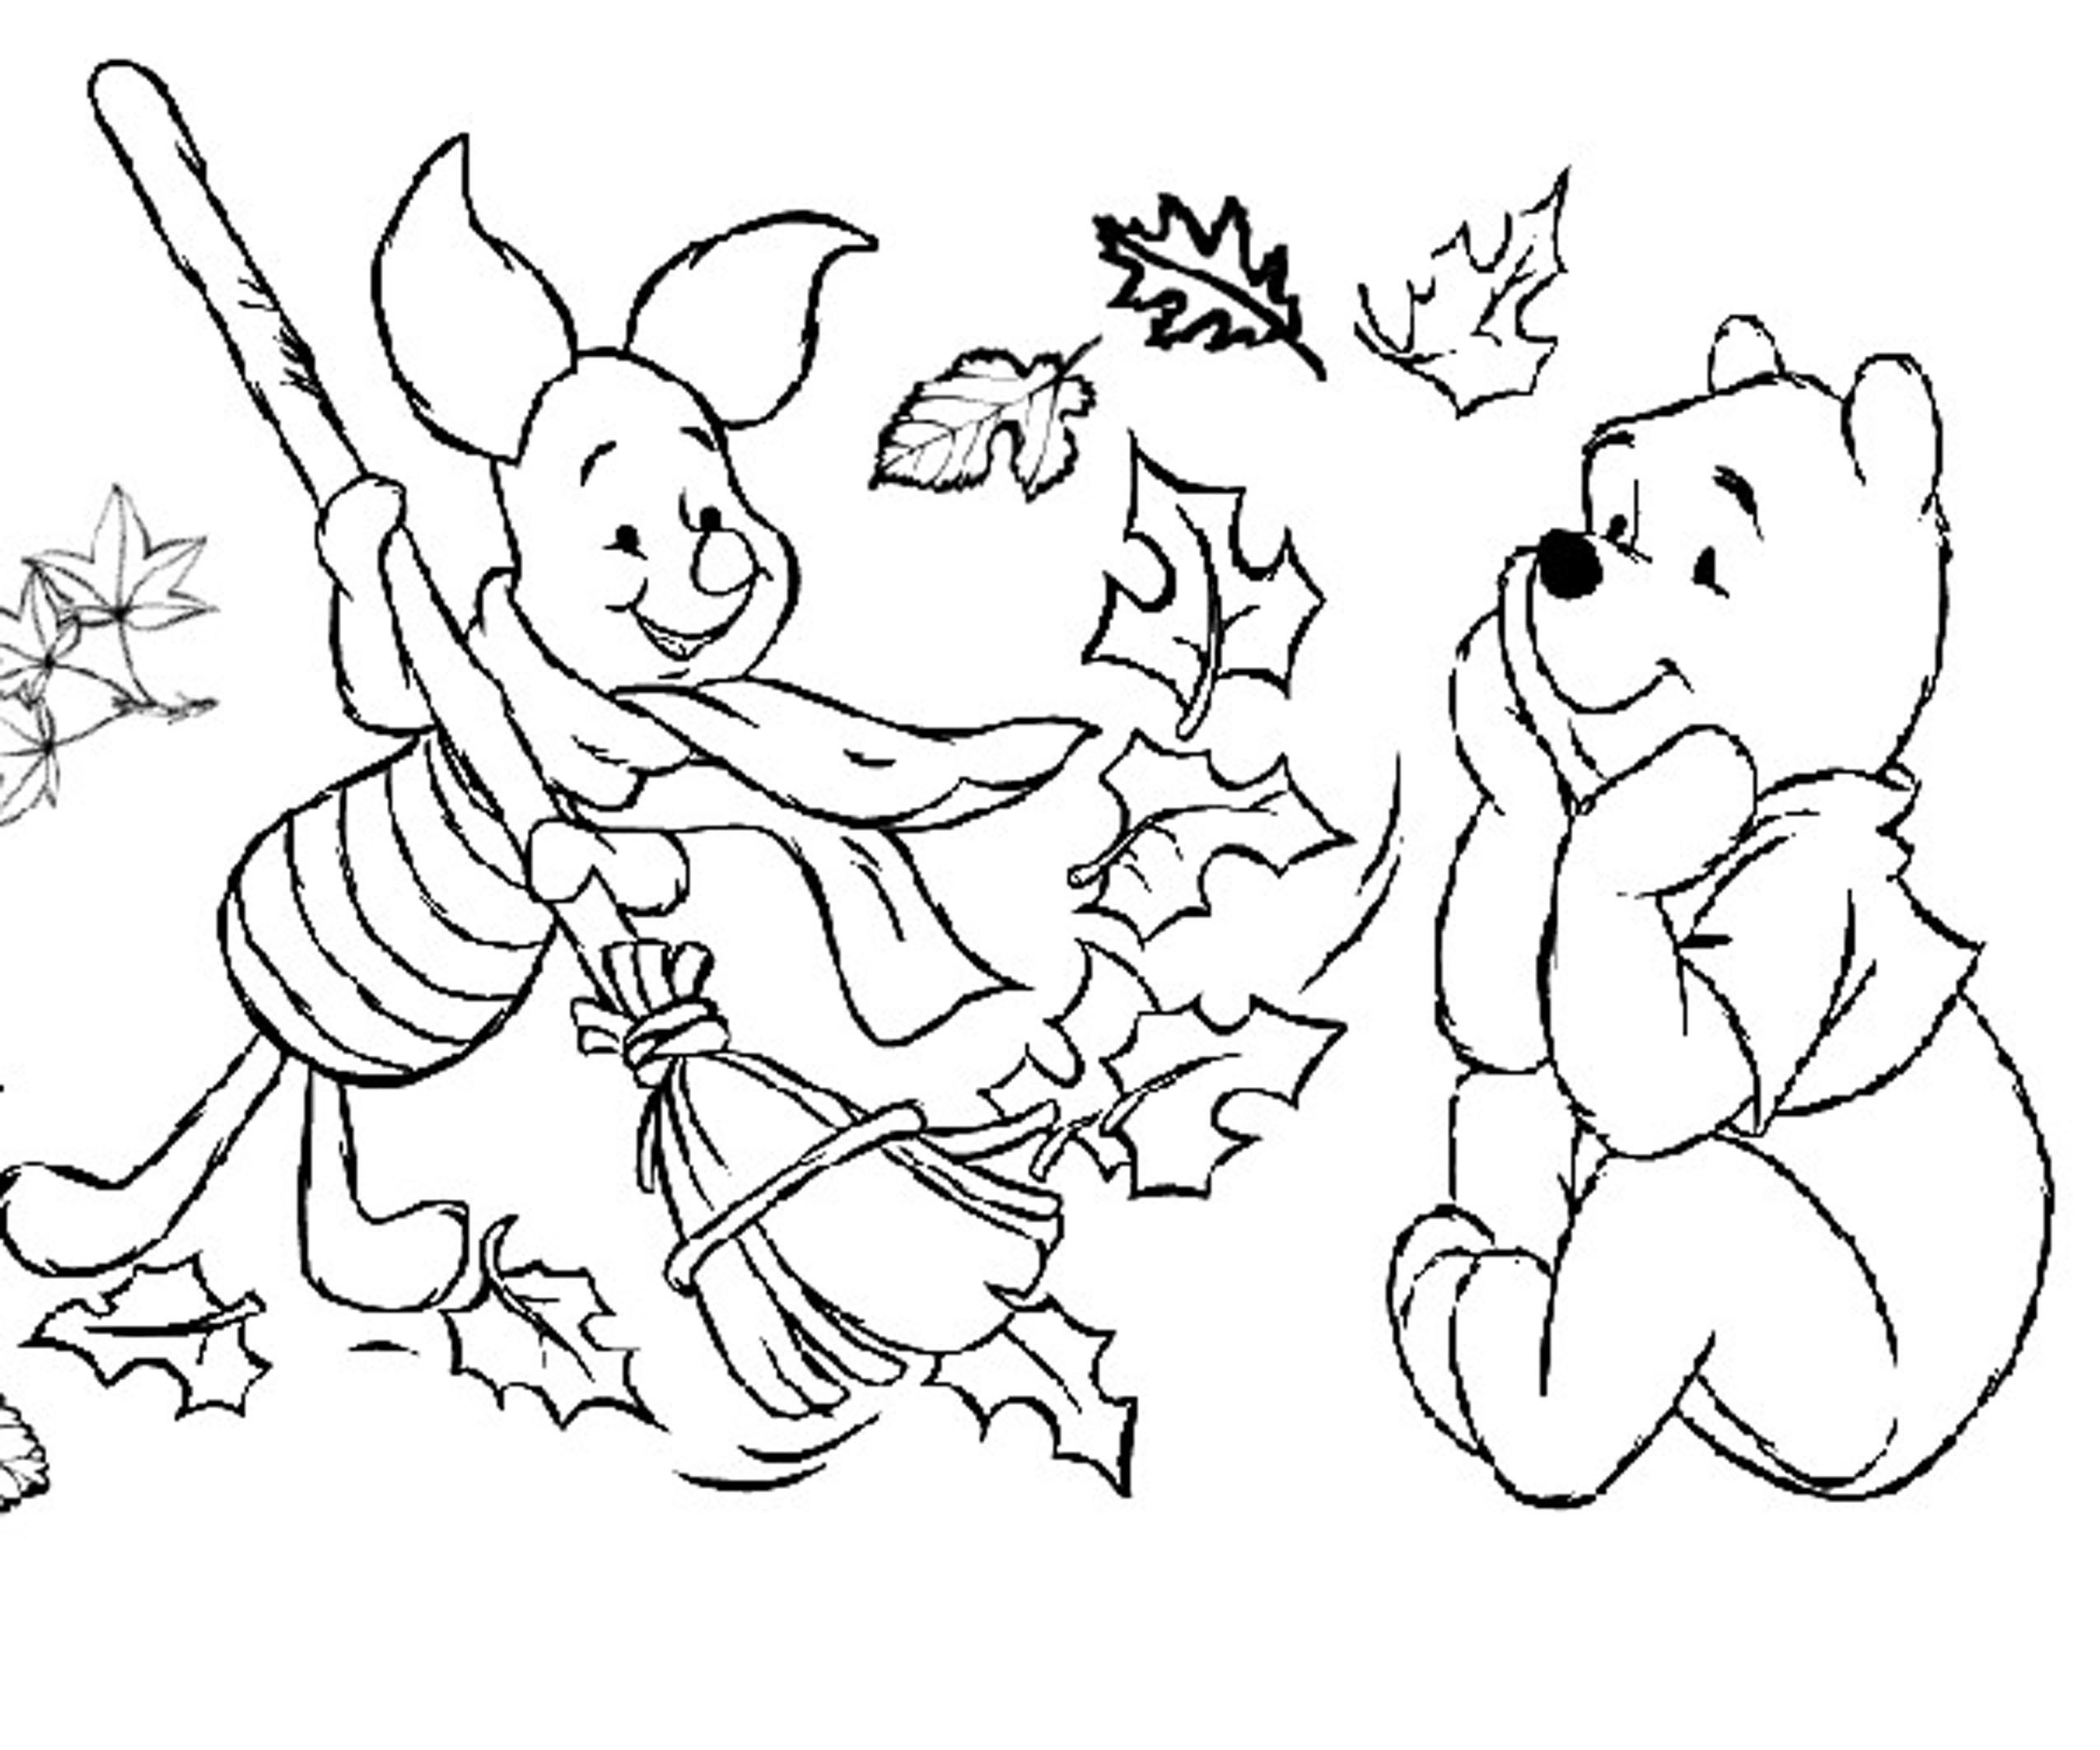 Fall Coloring Sheets Free 5 #6150 - Free Printable Autumn Coloring Sheets